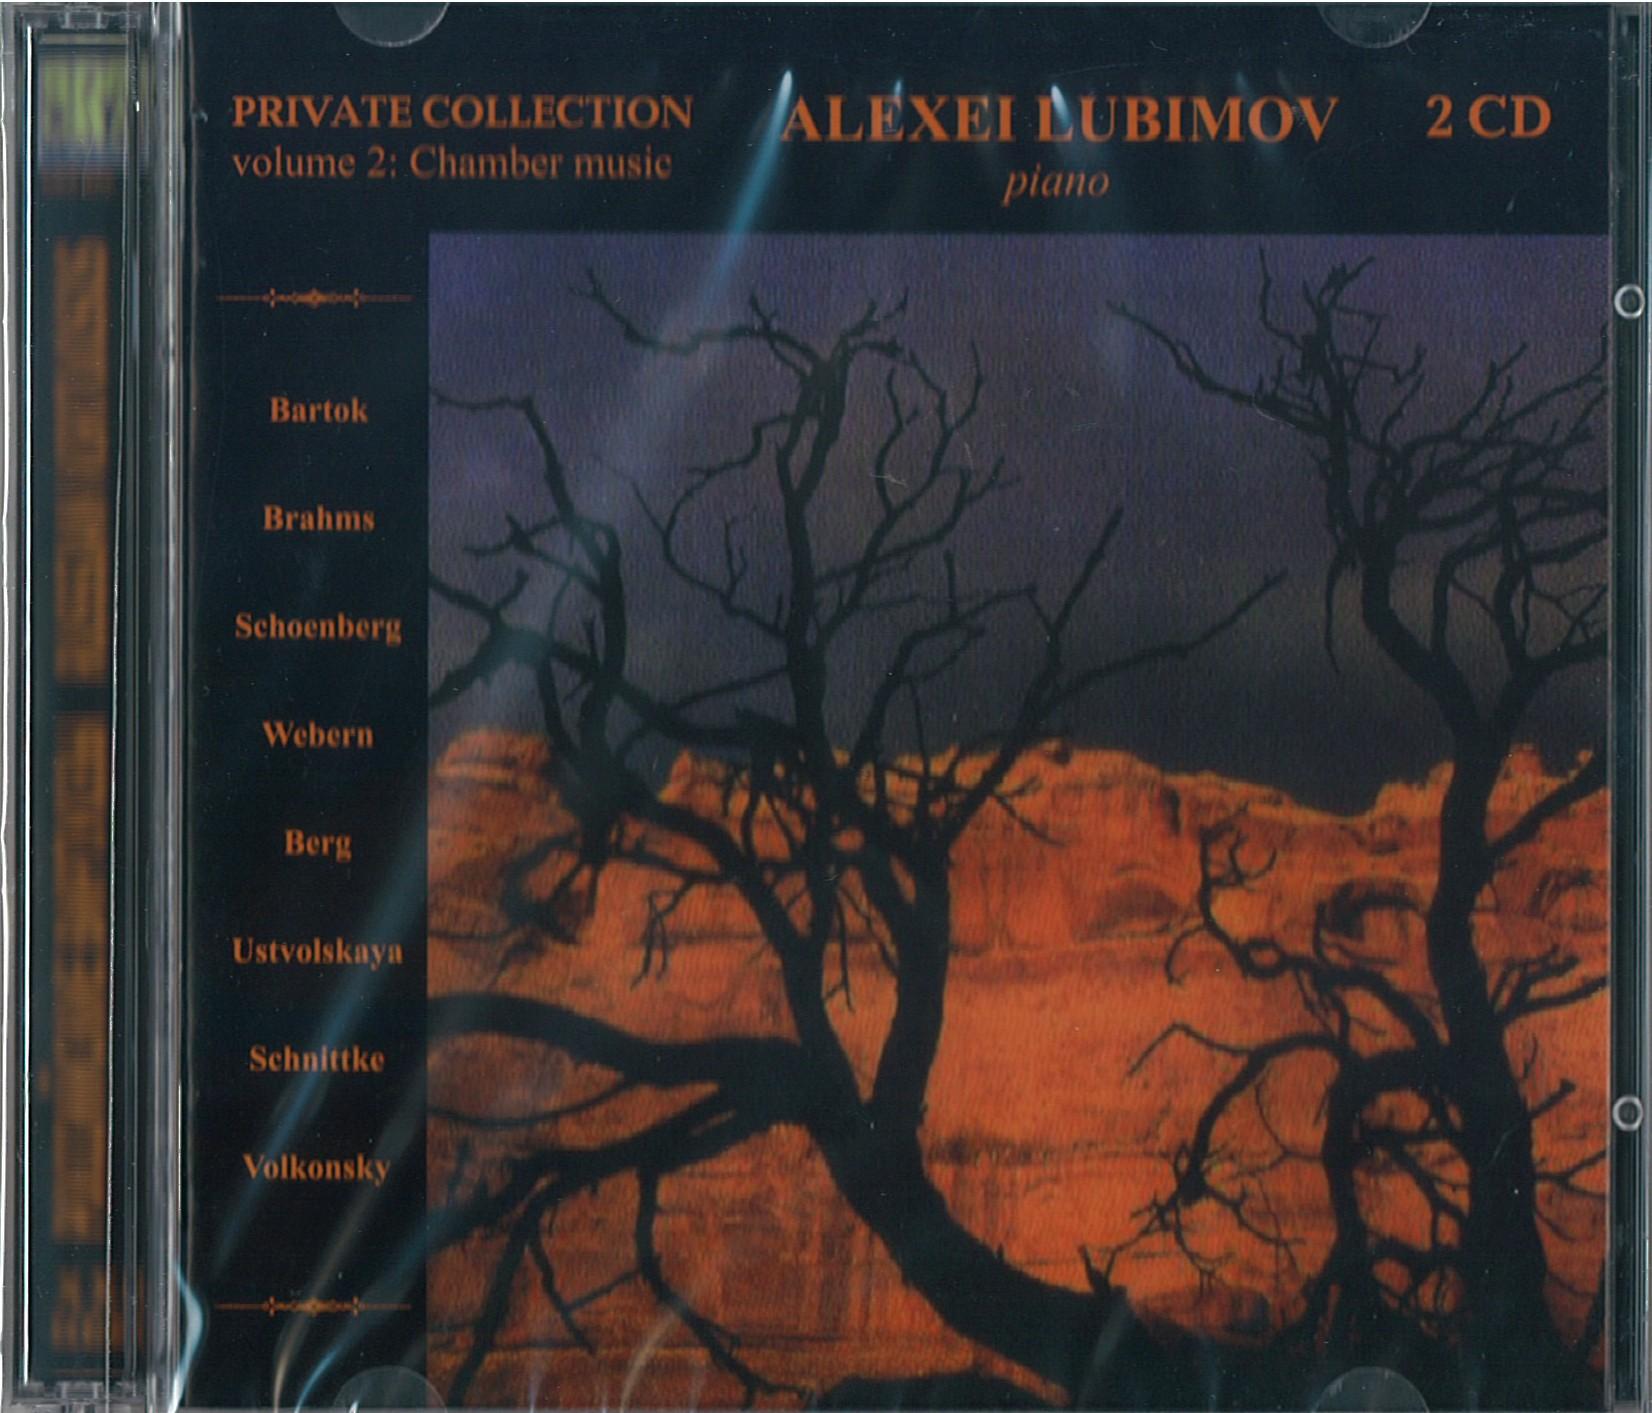 Lubimov Alexei, f-no. Vol. 2. Chamber music. 2CD